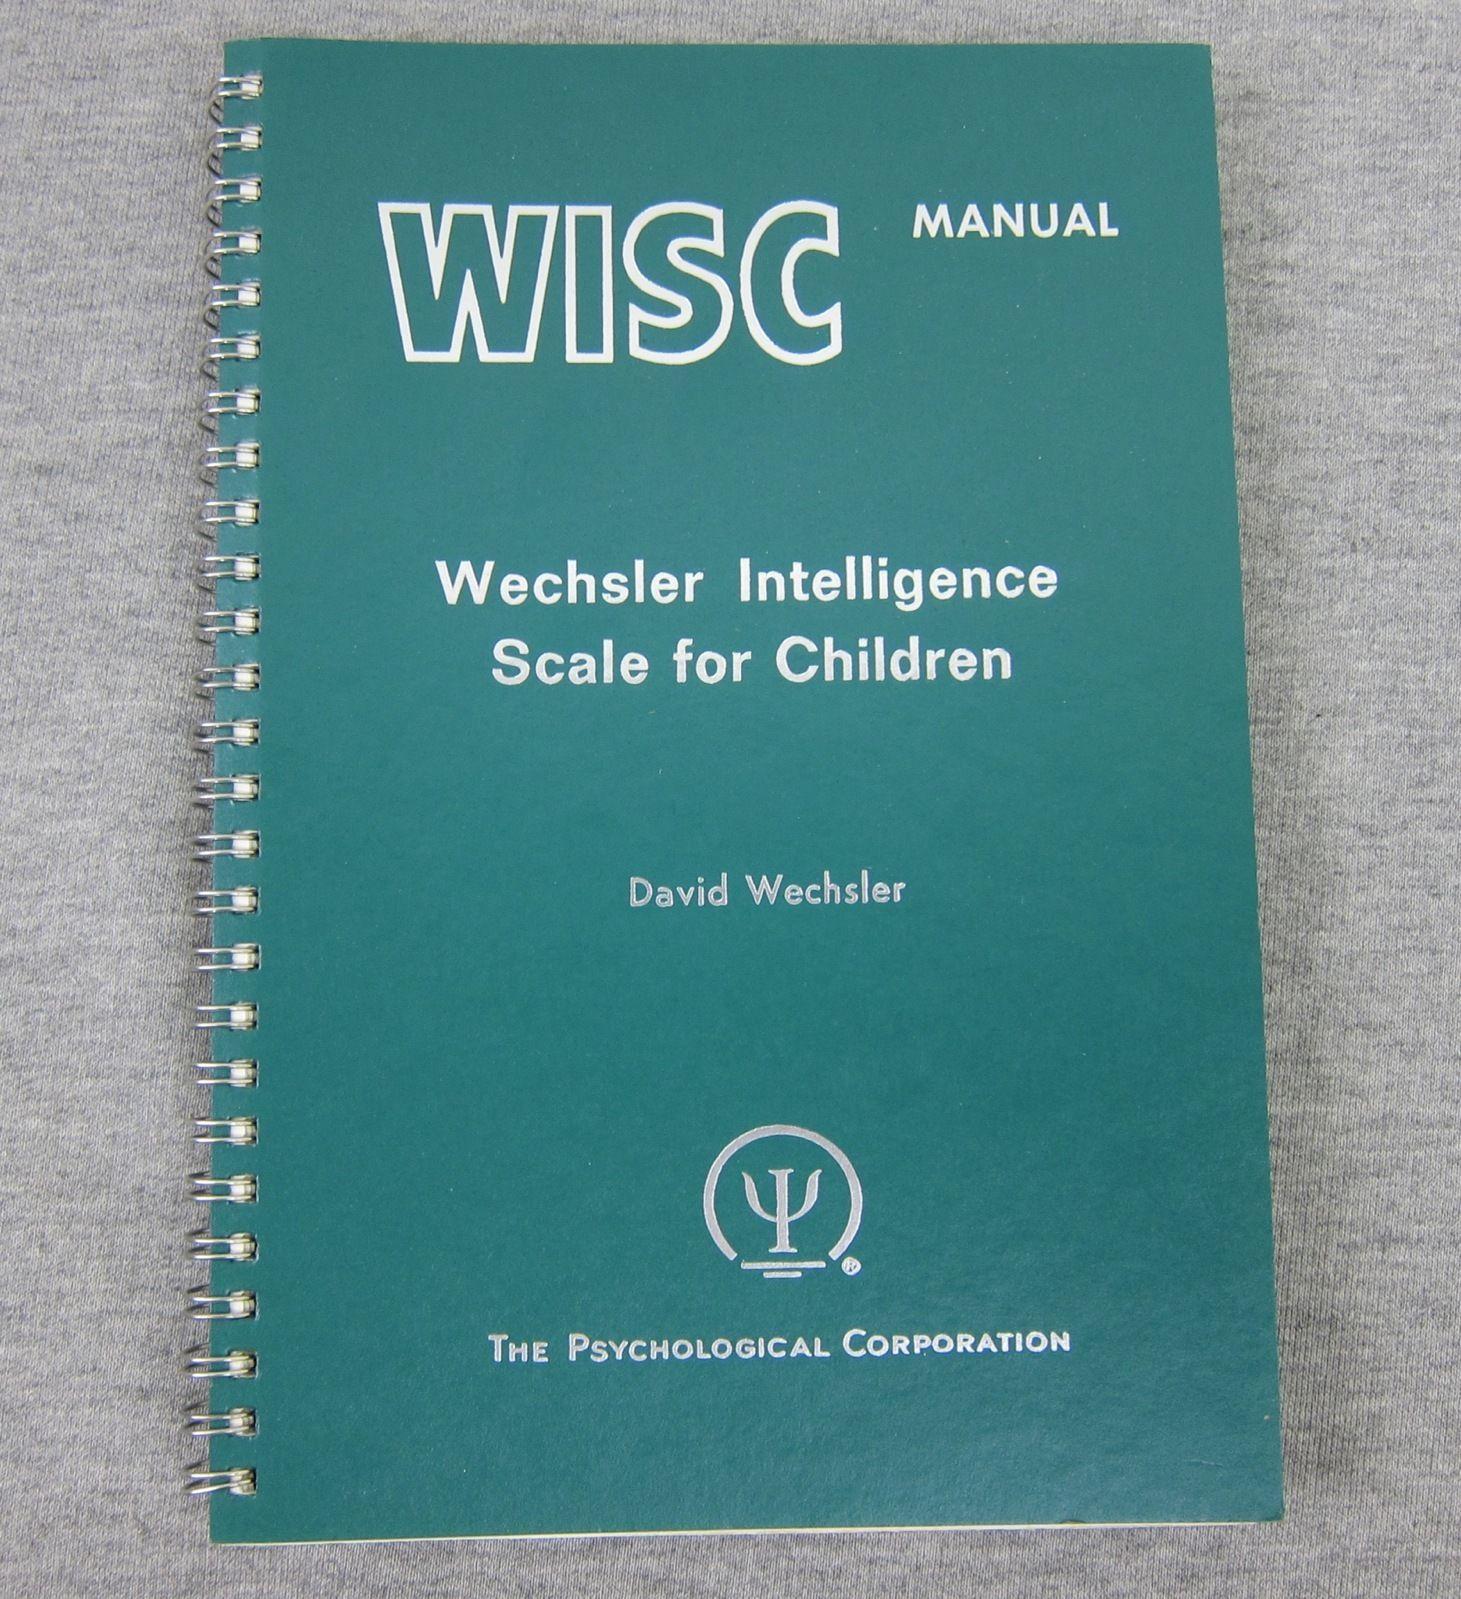 WISC Manual.jpg